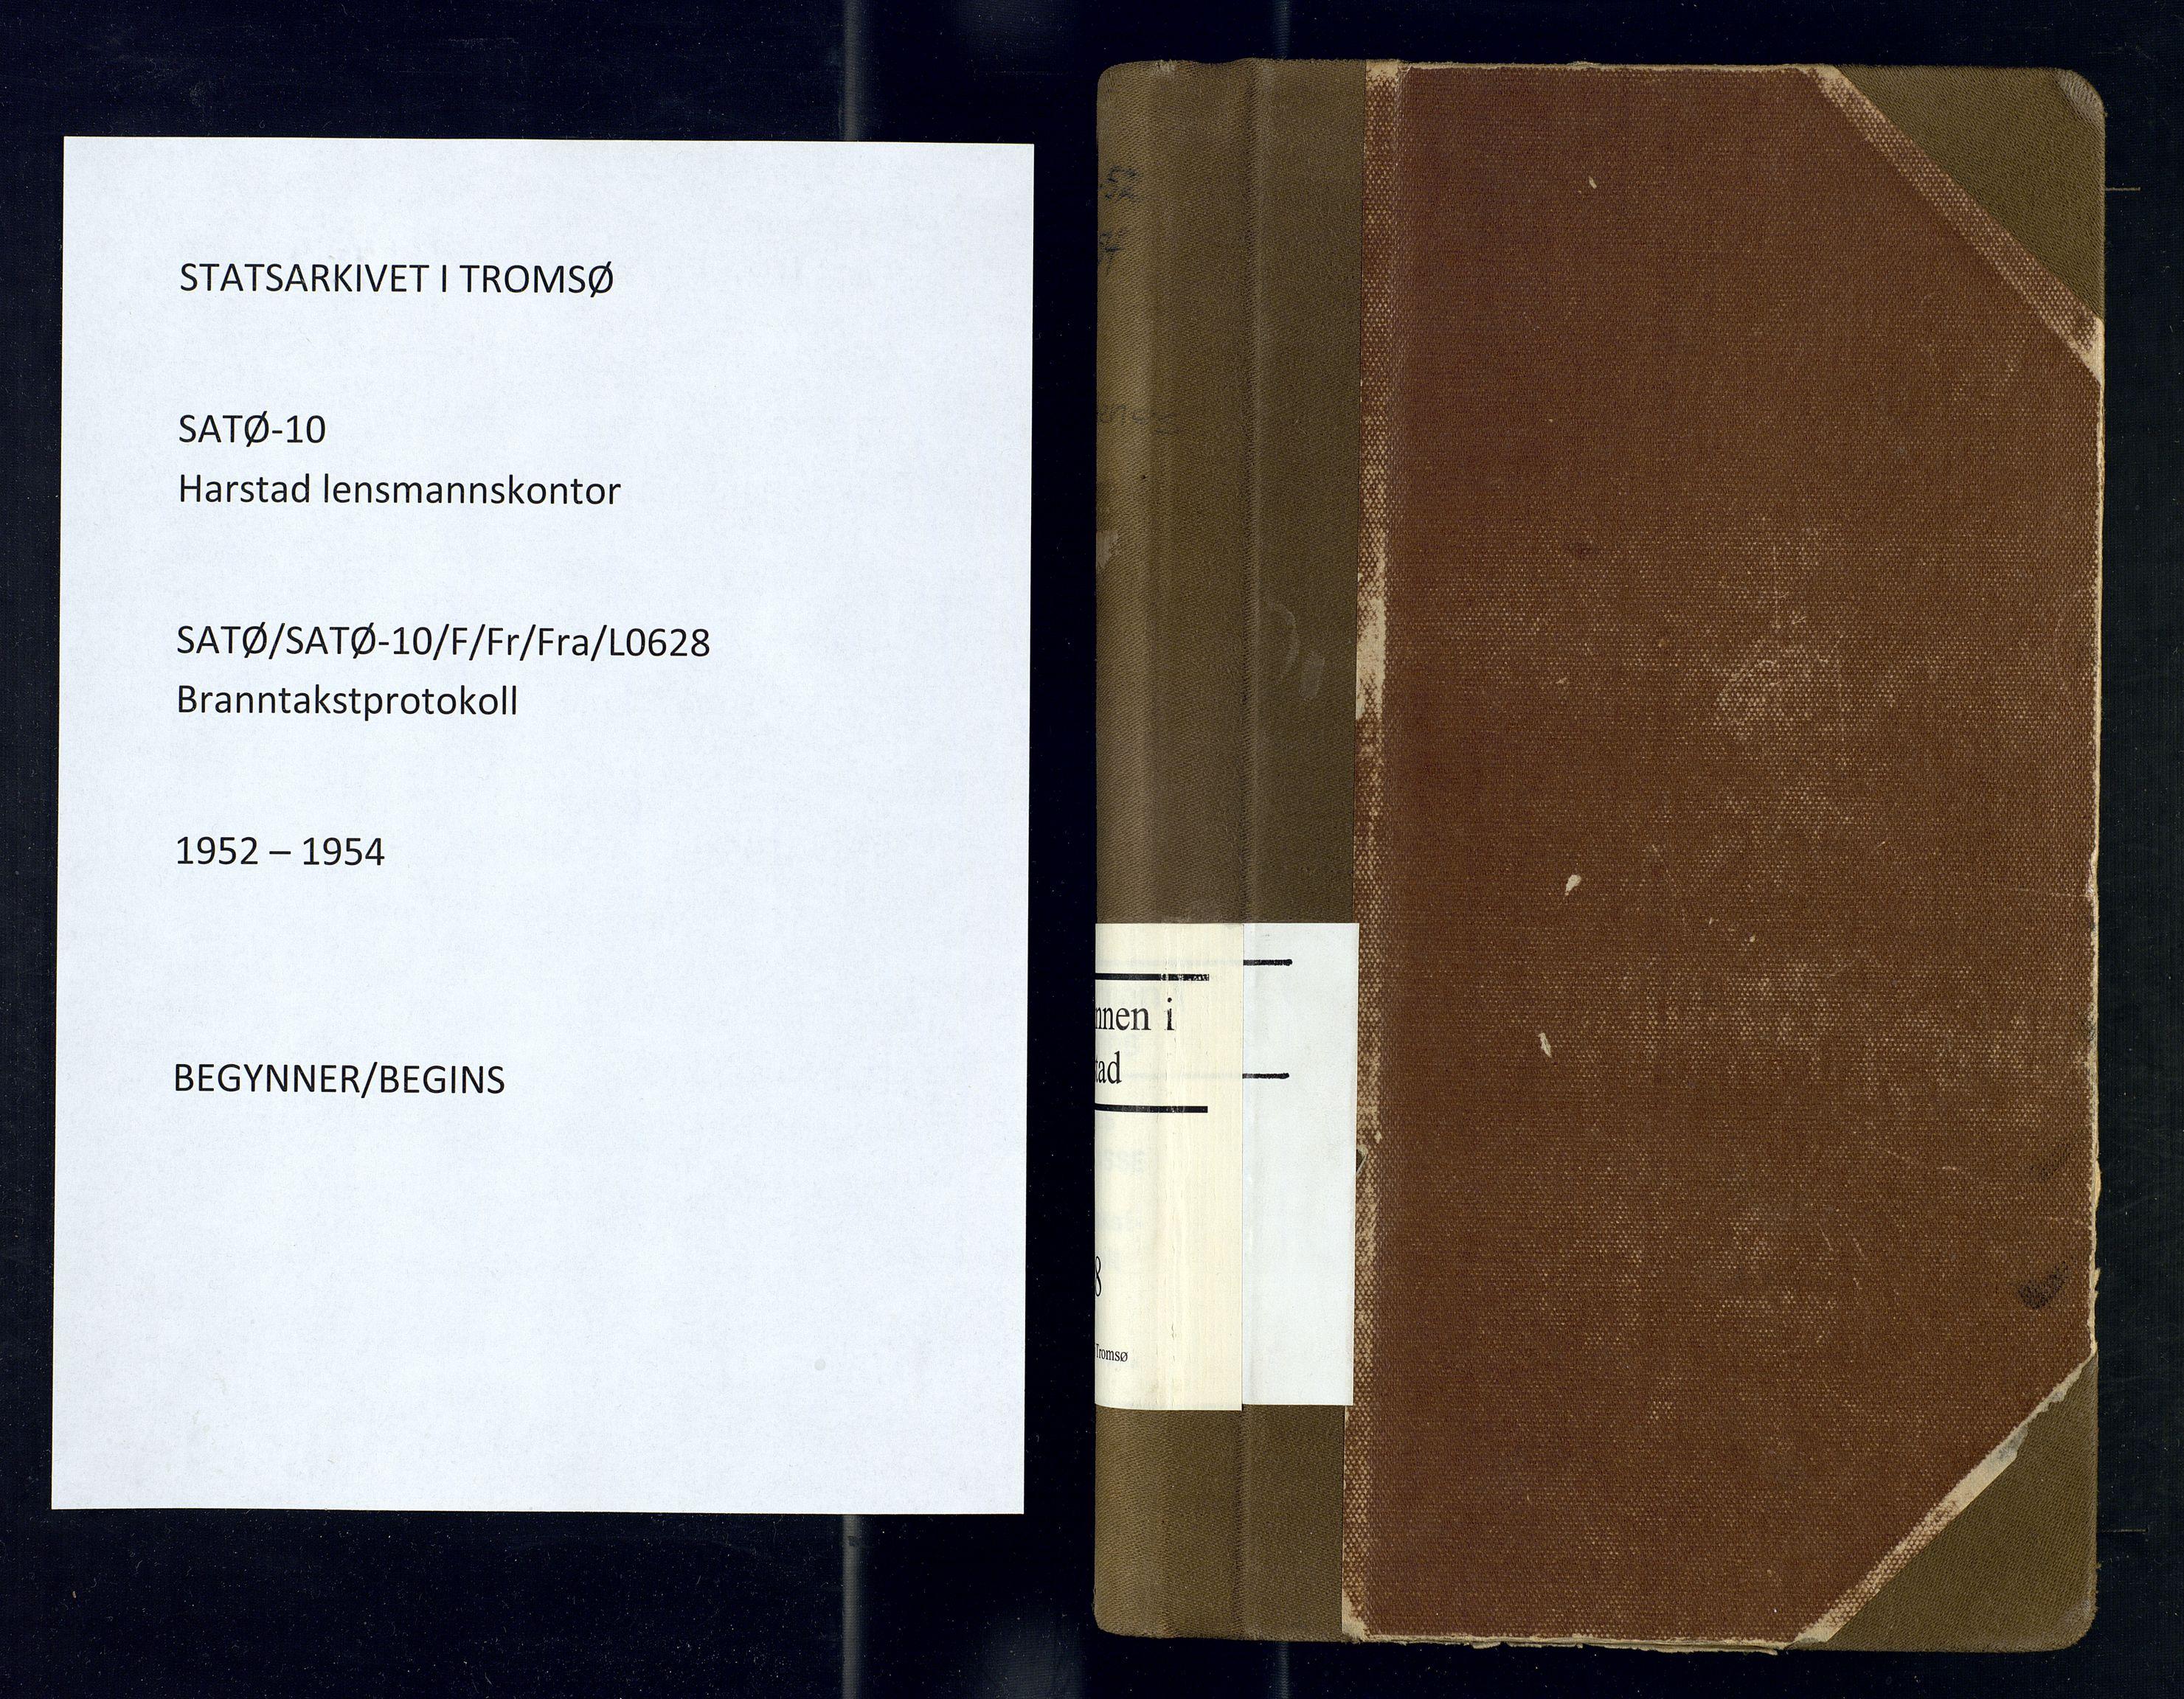 SATØ, Harstad lensmannskontor, F/Fr/Fra/L0628: Branntakstprotokoll, 1952-1954